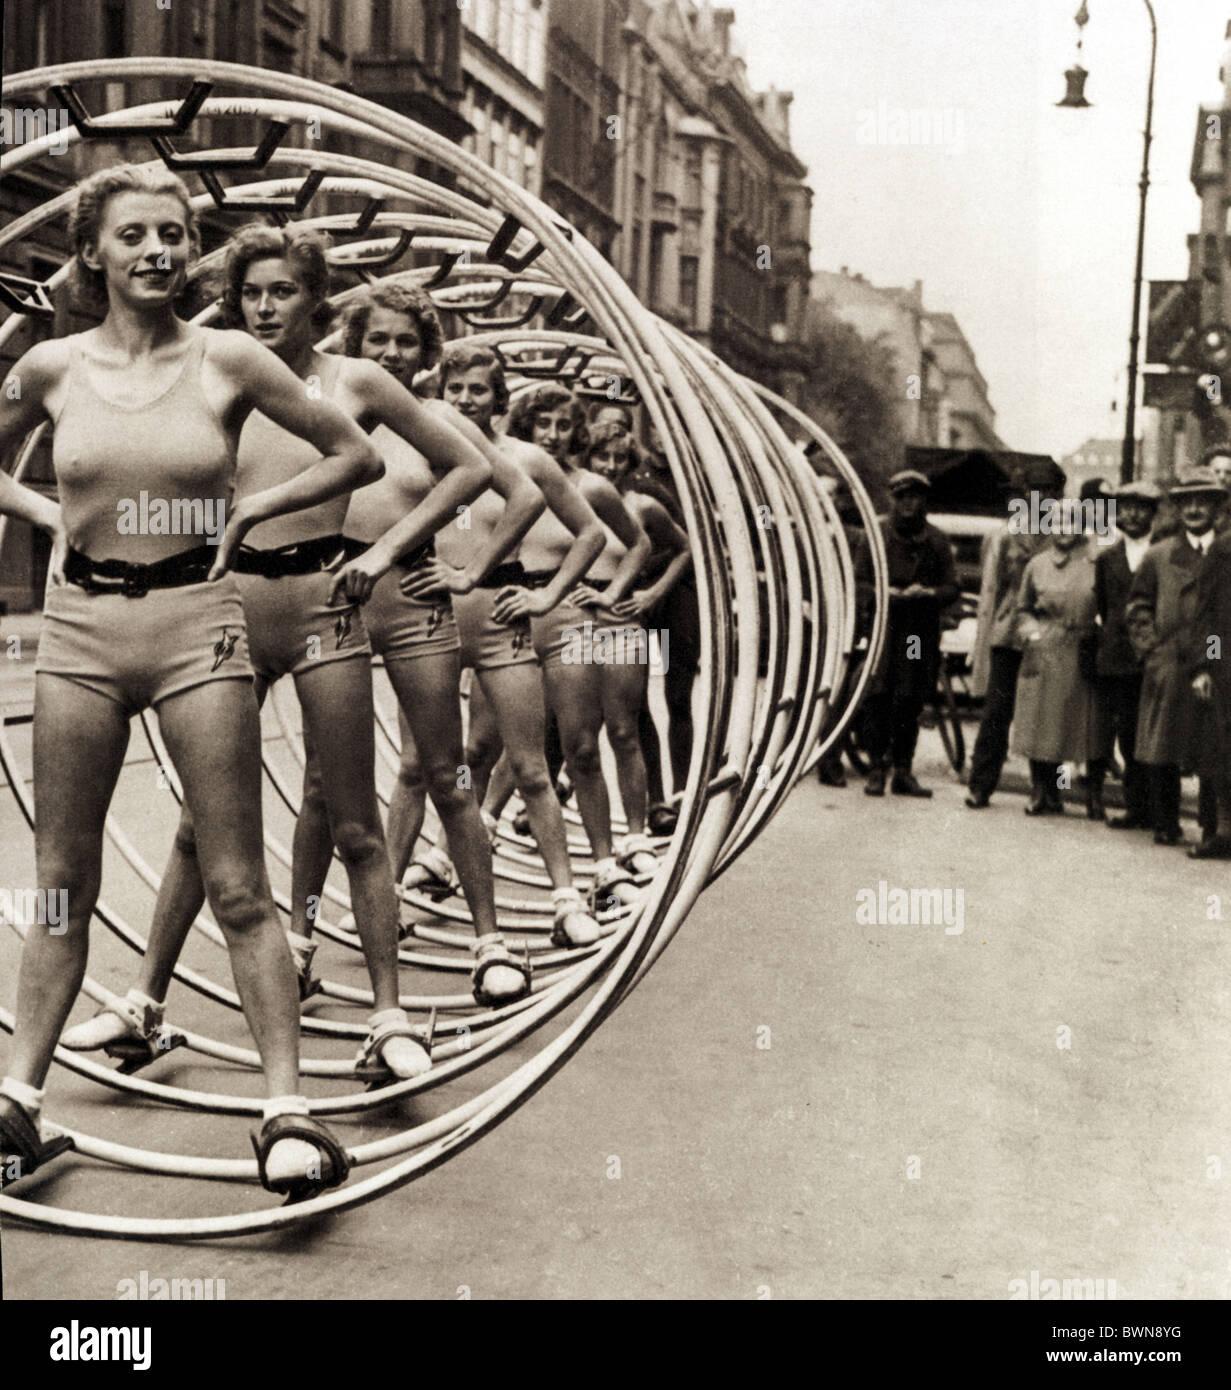 Ginnastica ruota 1931 Berlin Germania Europa donne spettatori presentazione Wintergarten Repertory Theatre Cen Immagini Stock